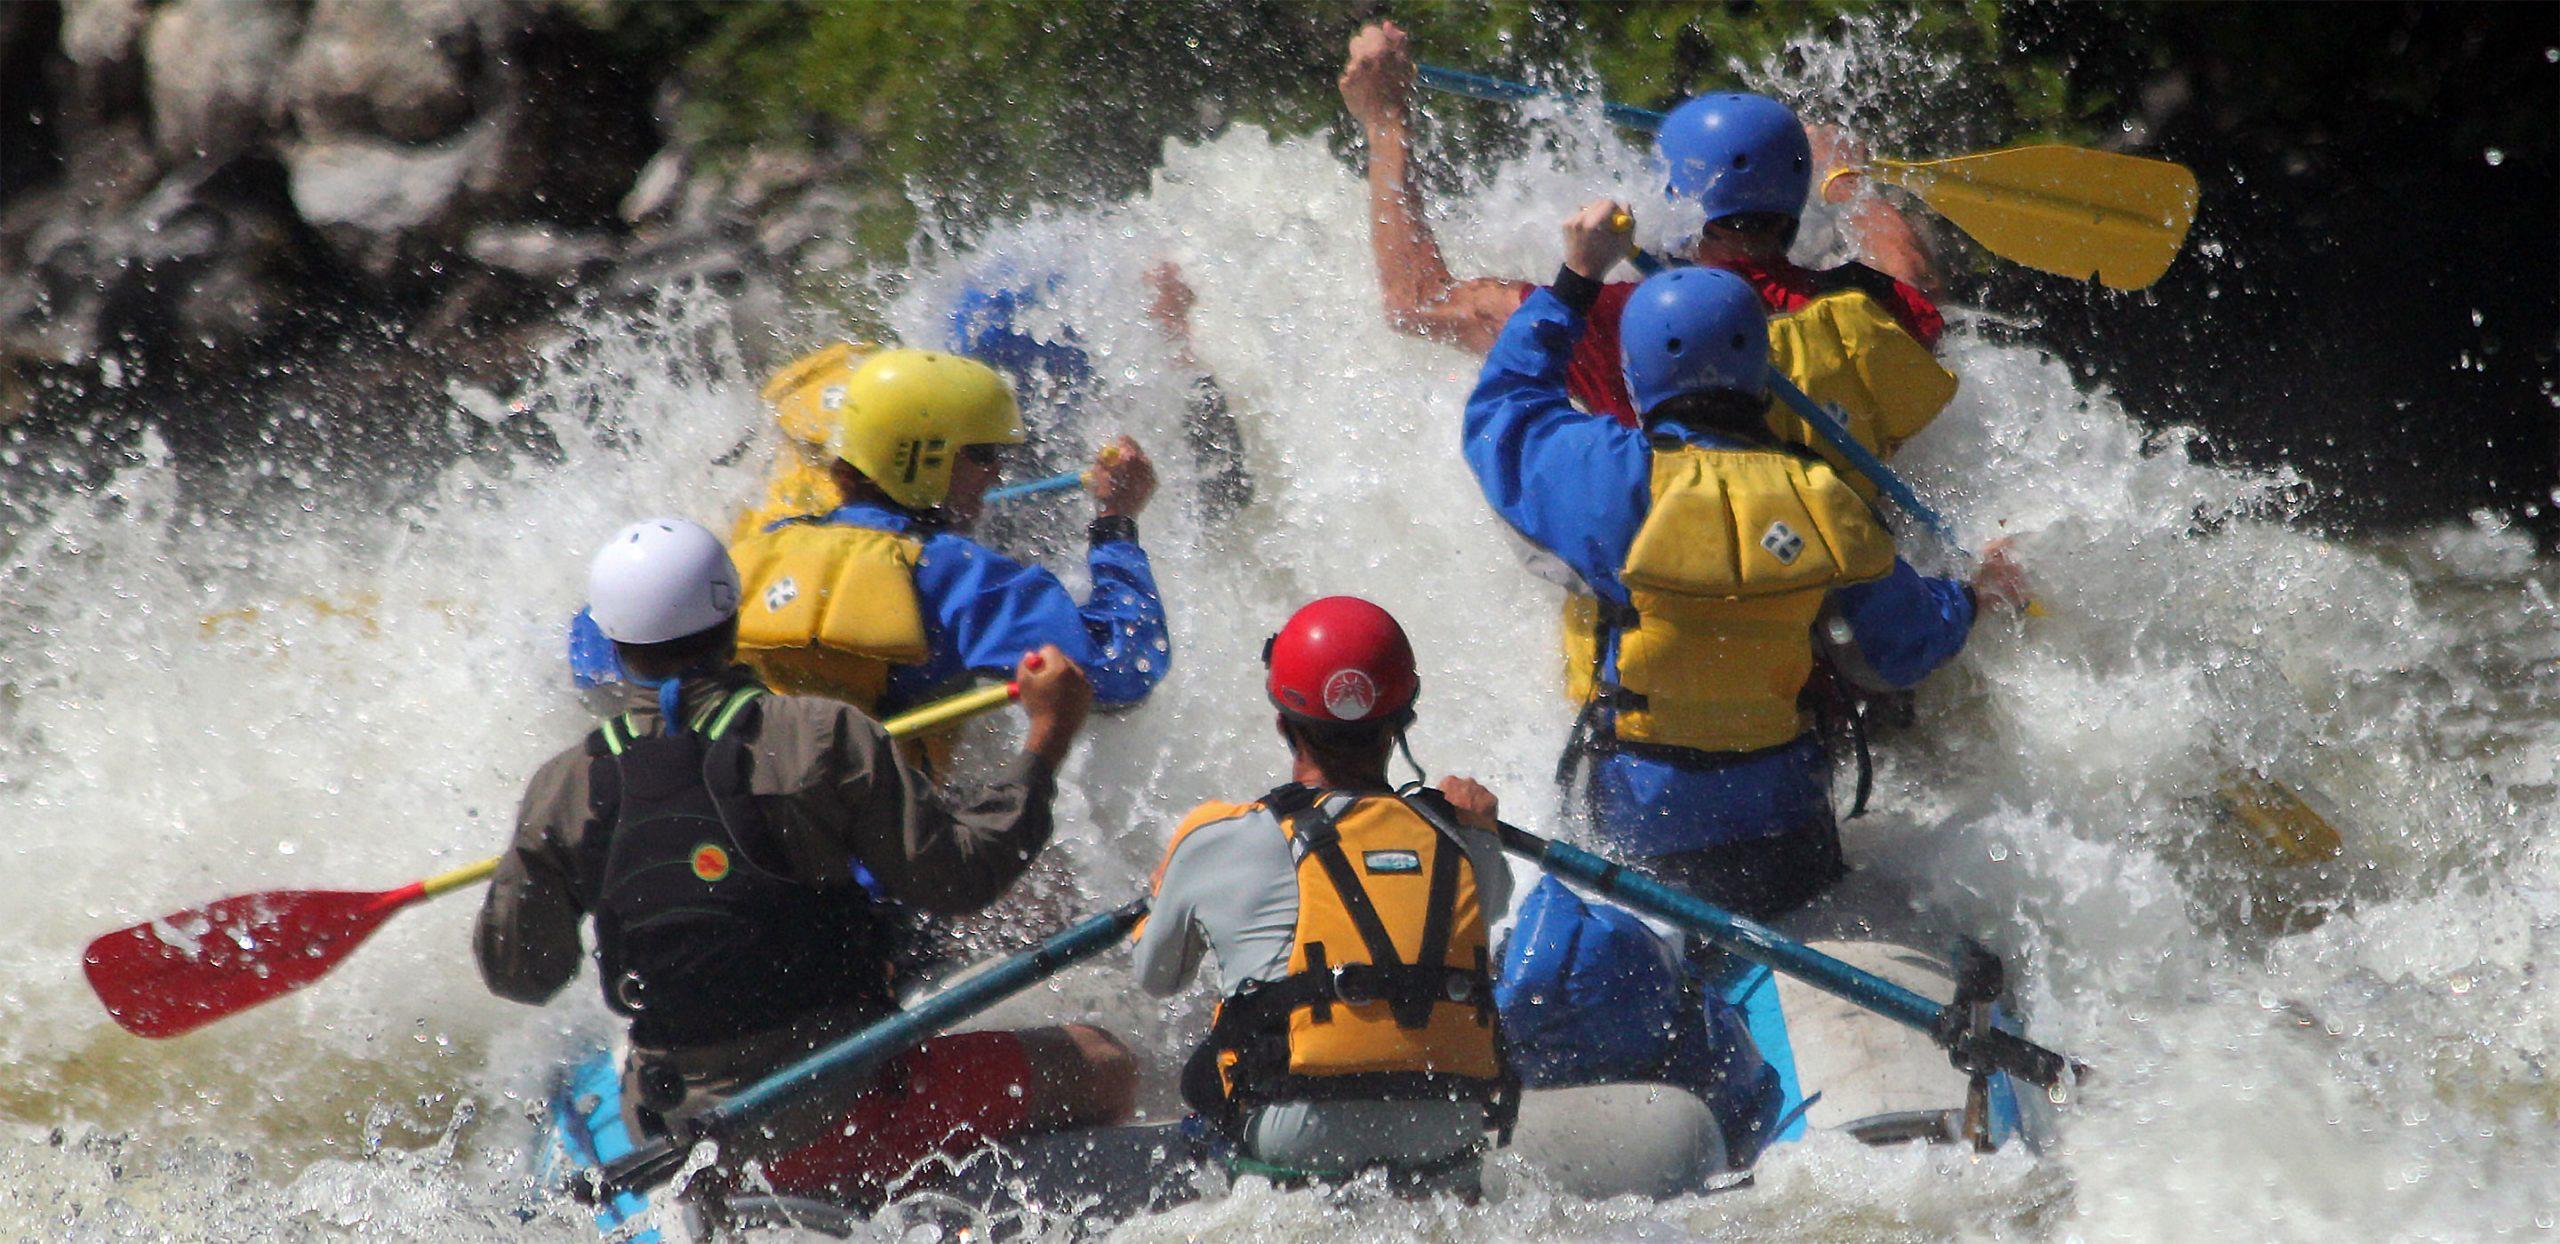 Upper Klamath Rafting - Whitewater Rafting - Adventure